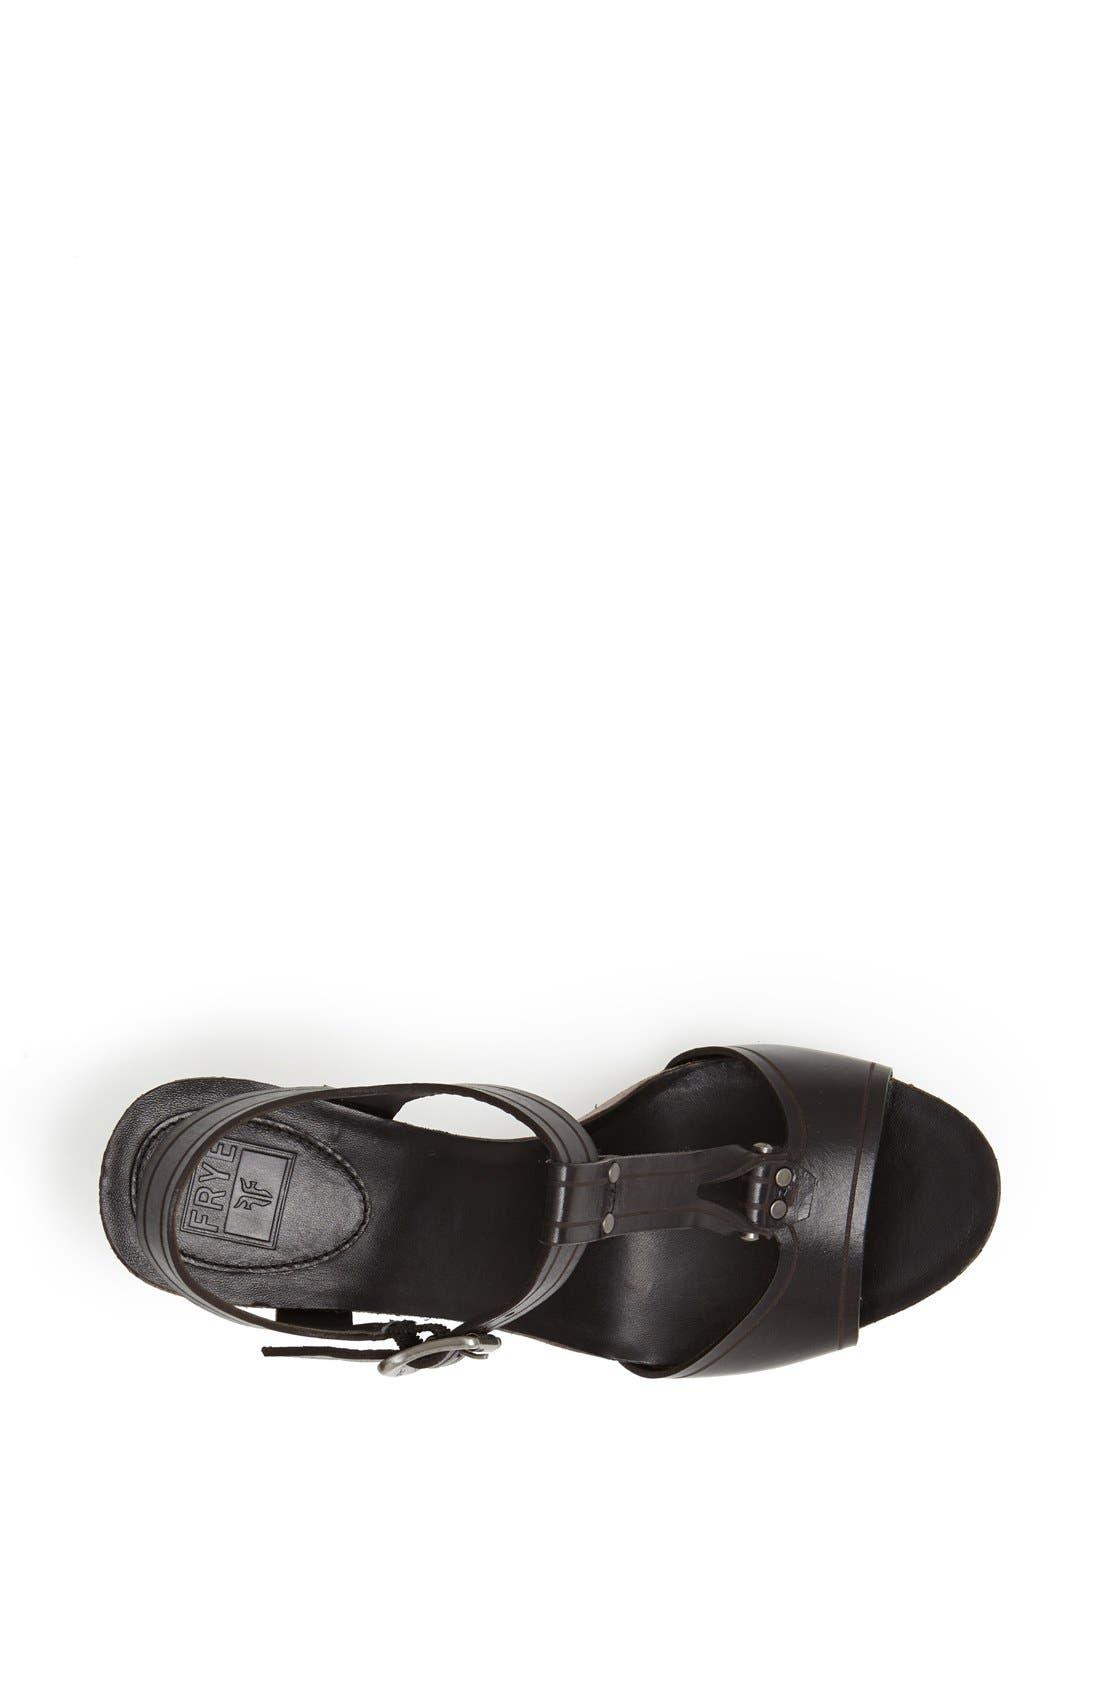 FRYE, 'Silvie' Y-Strap Leather Sandal, Alternate thumbnail 3, color, 001